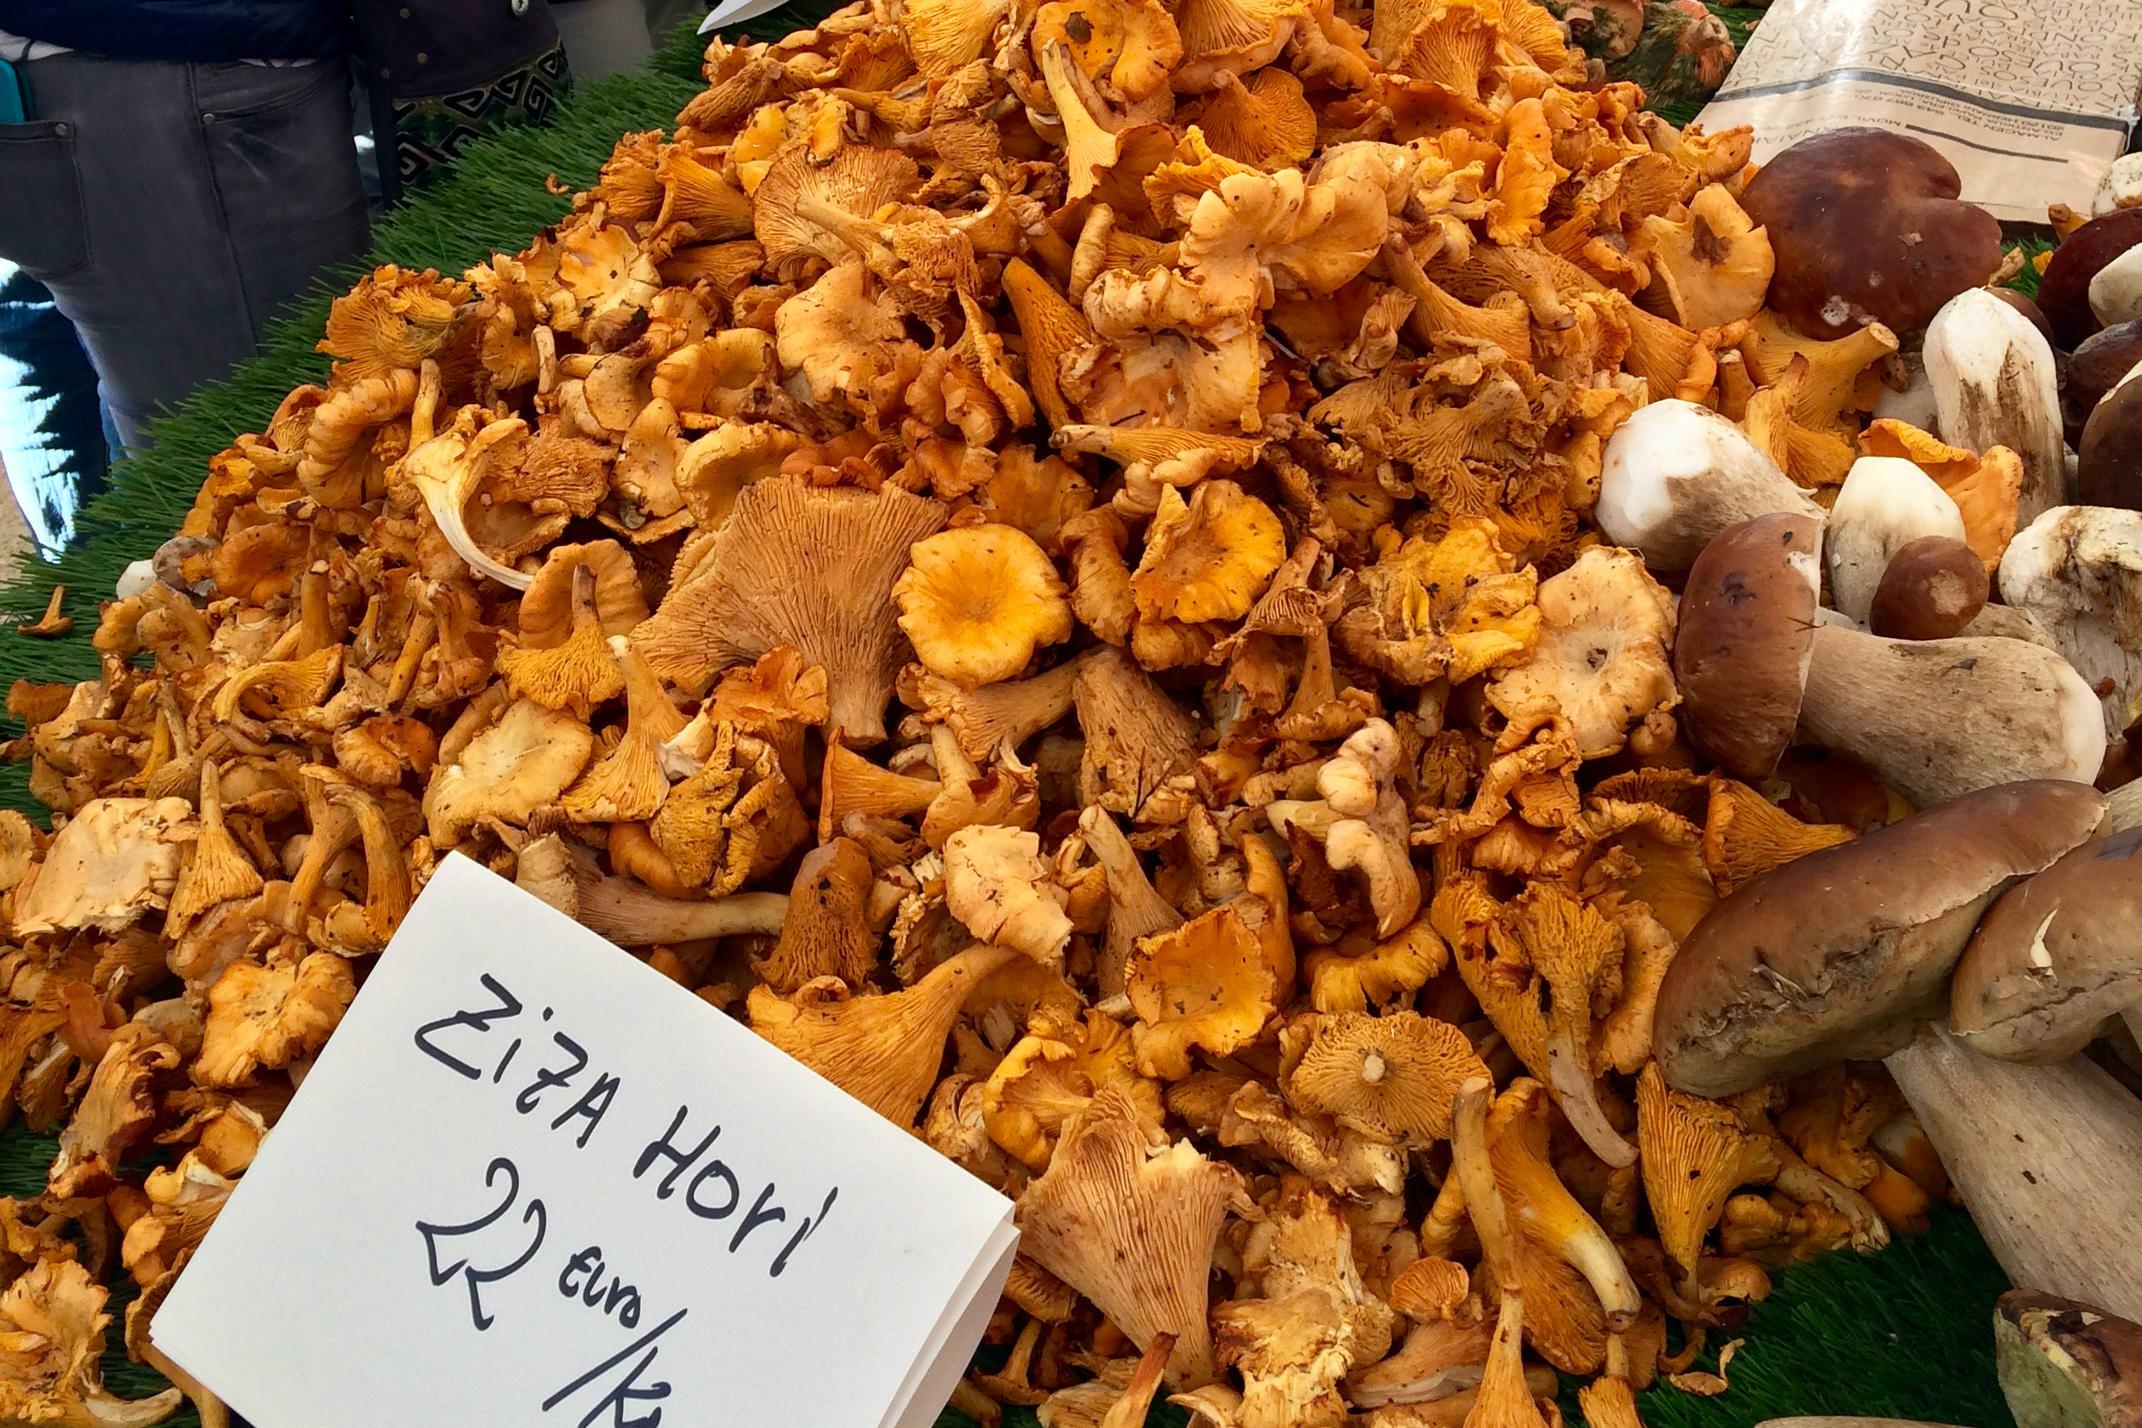 Spain basque country tolosa market mushrooms c xabi etxarri